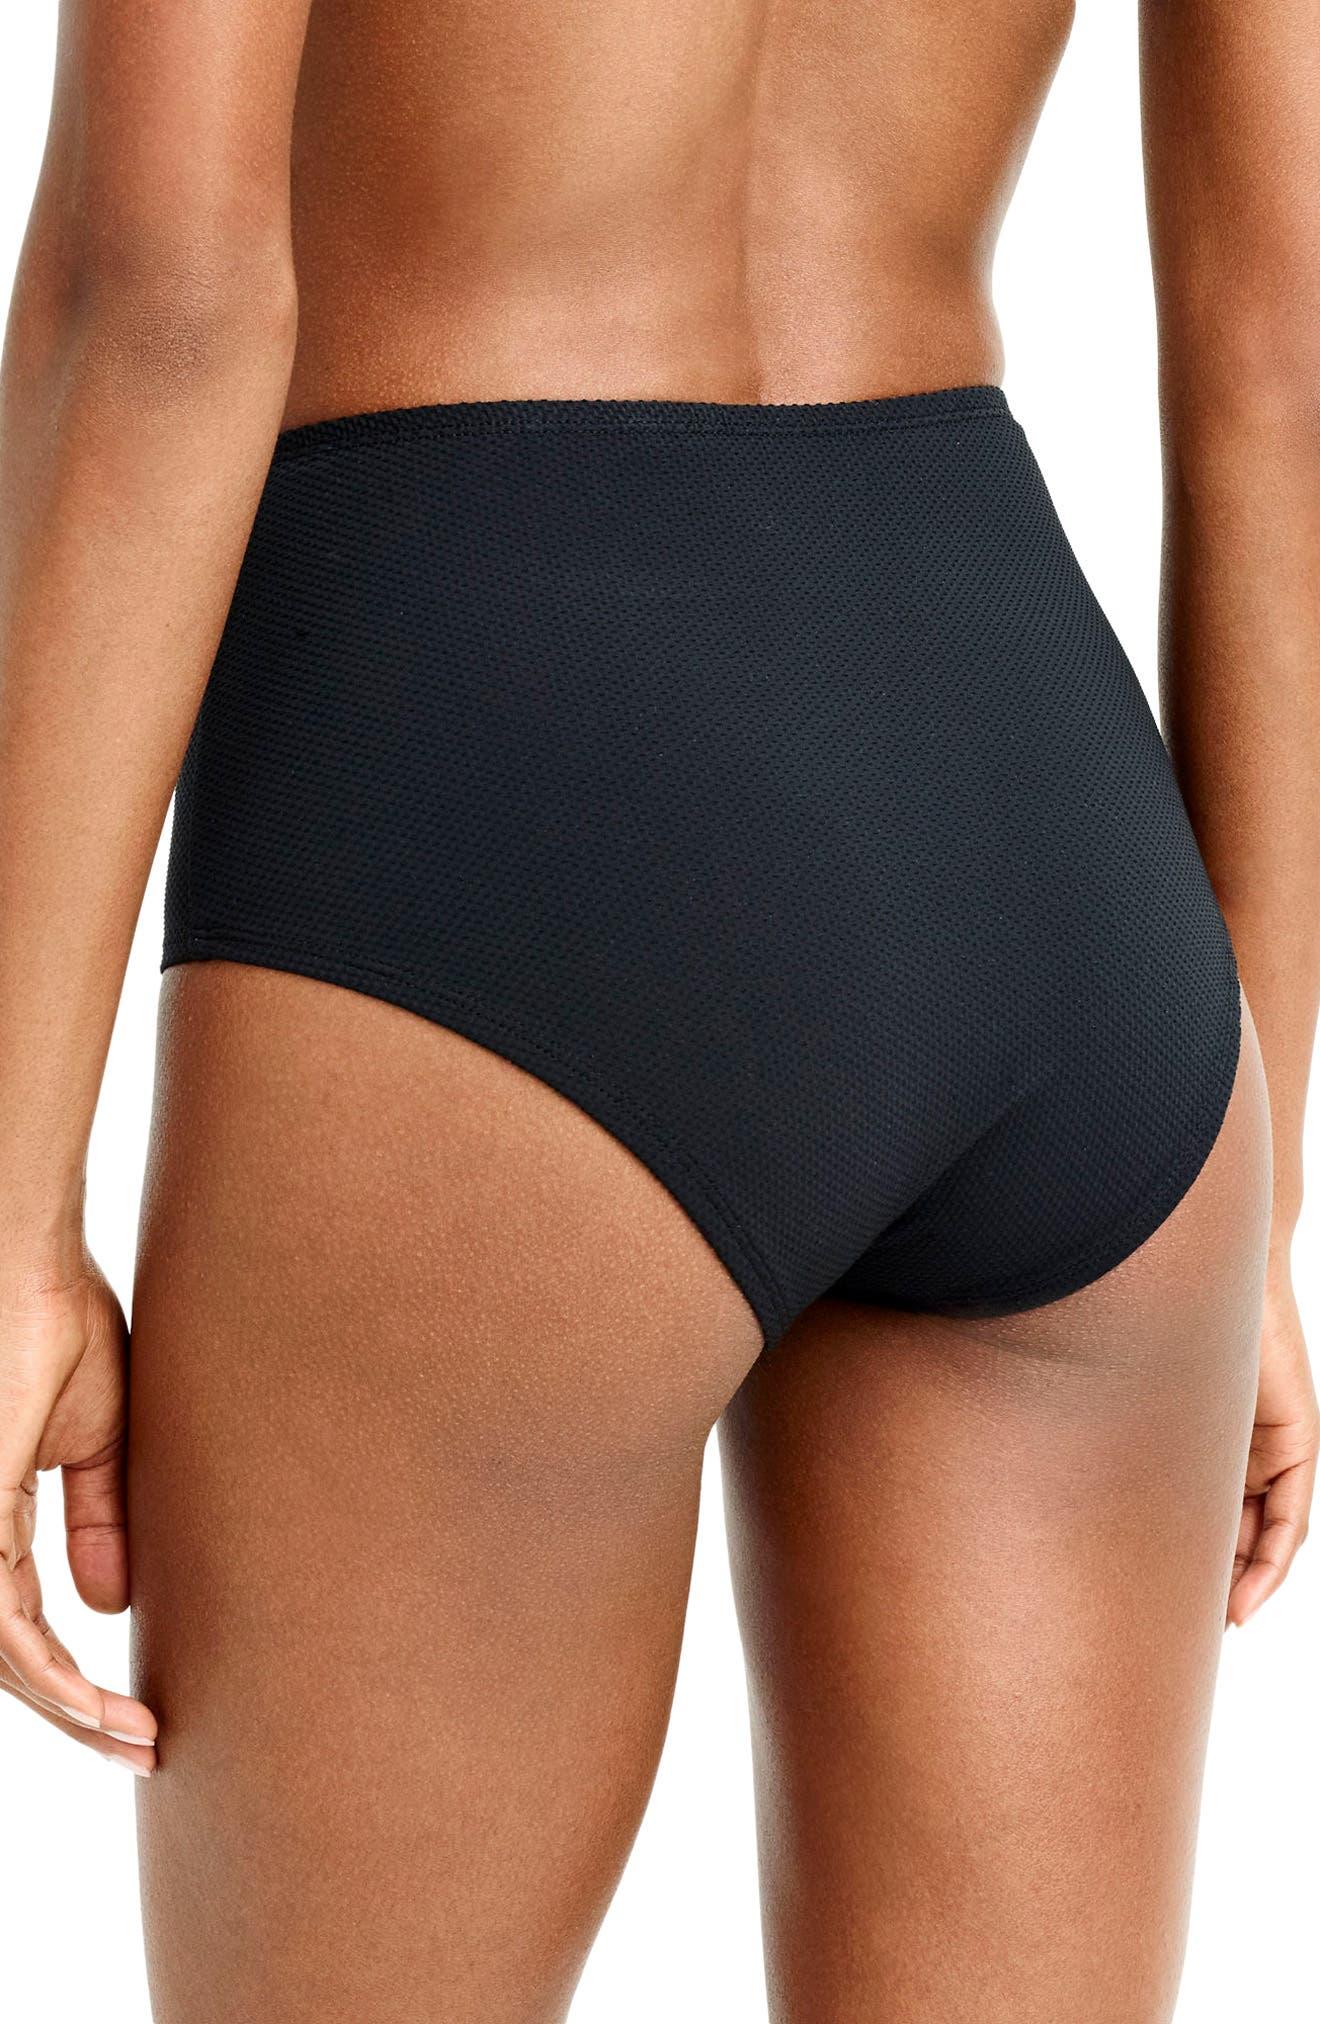 Piqué High Waist Bikini Bottoms,                             Alternate thumbnail 2, color,                             001